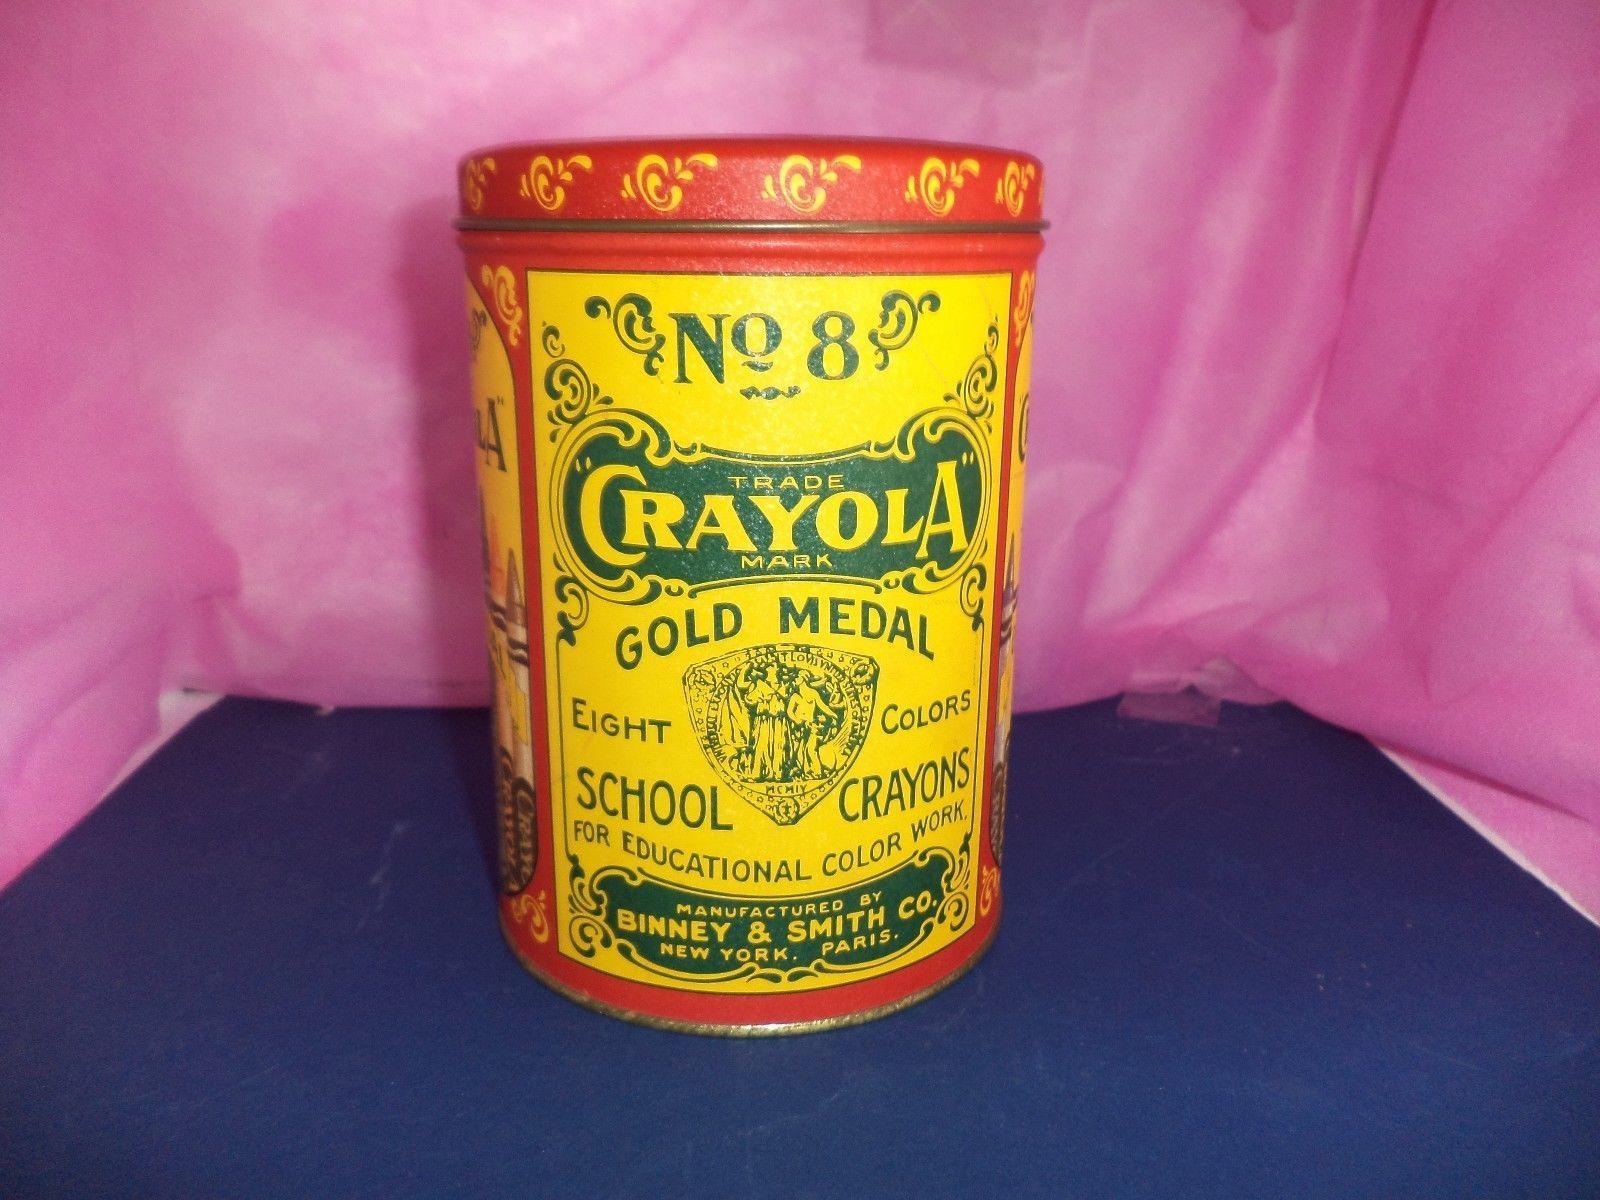 Gold Medal Crayola School Crayons Tin